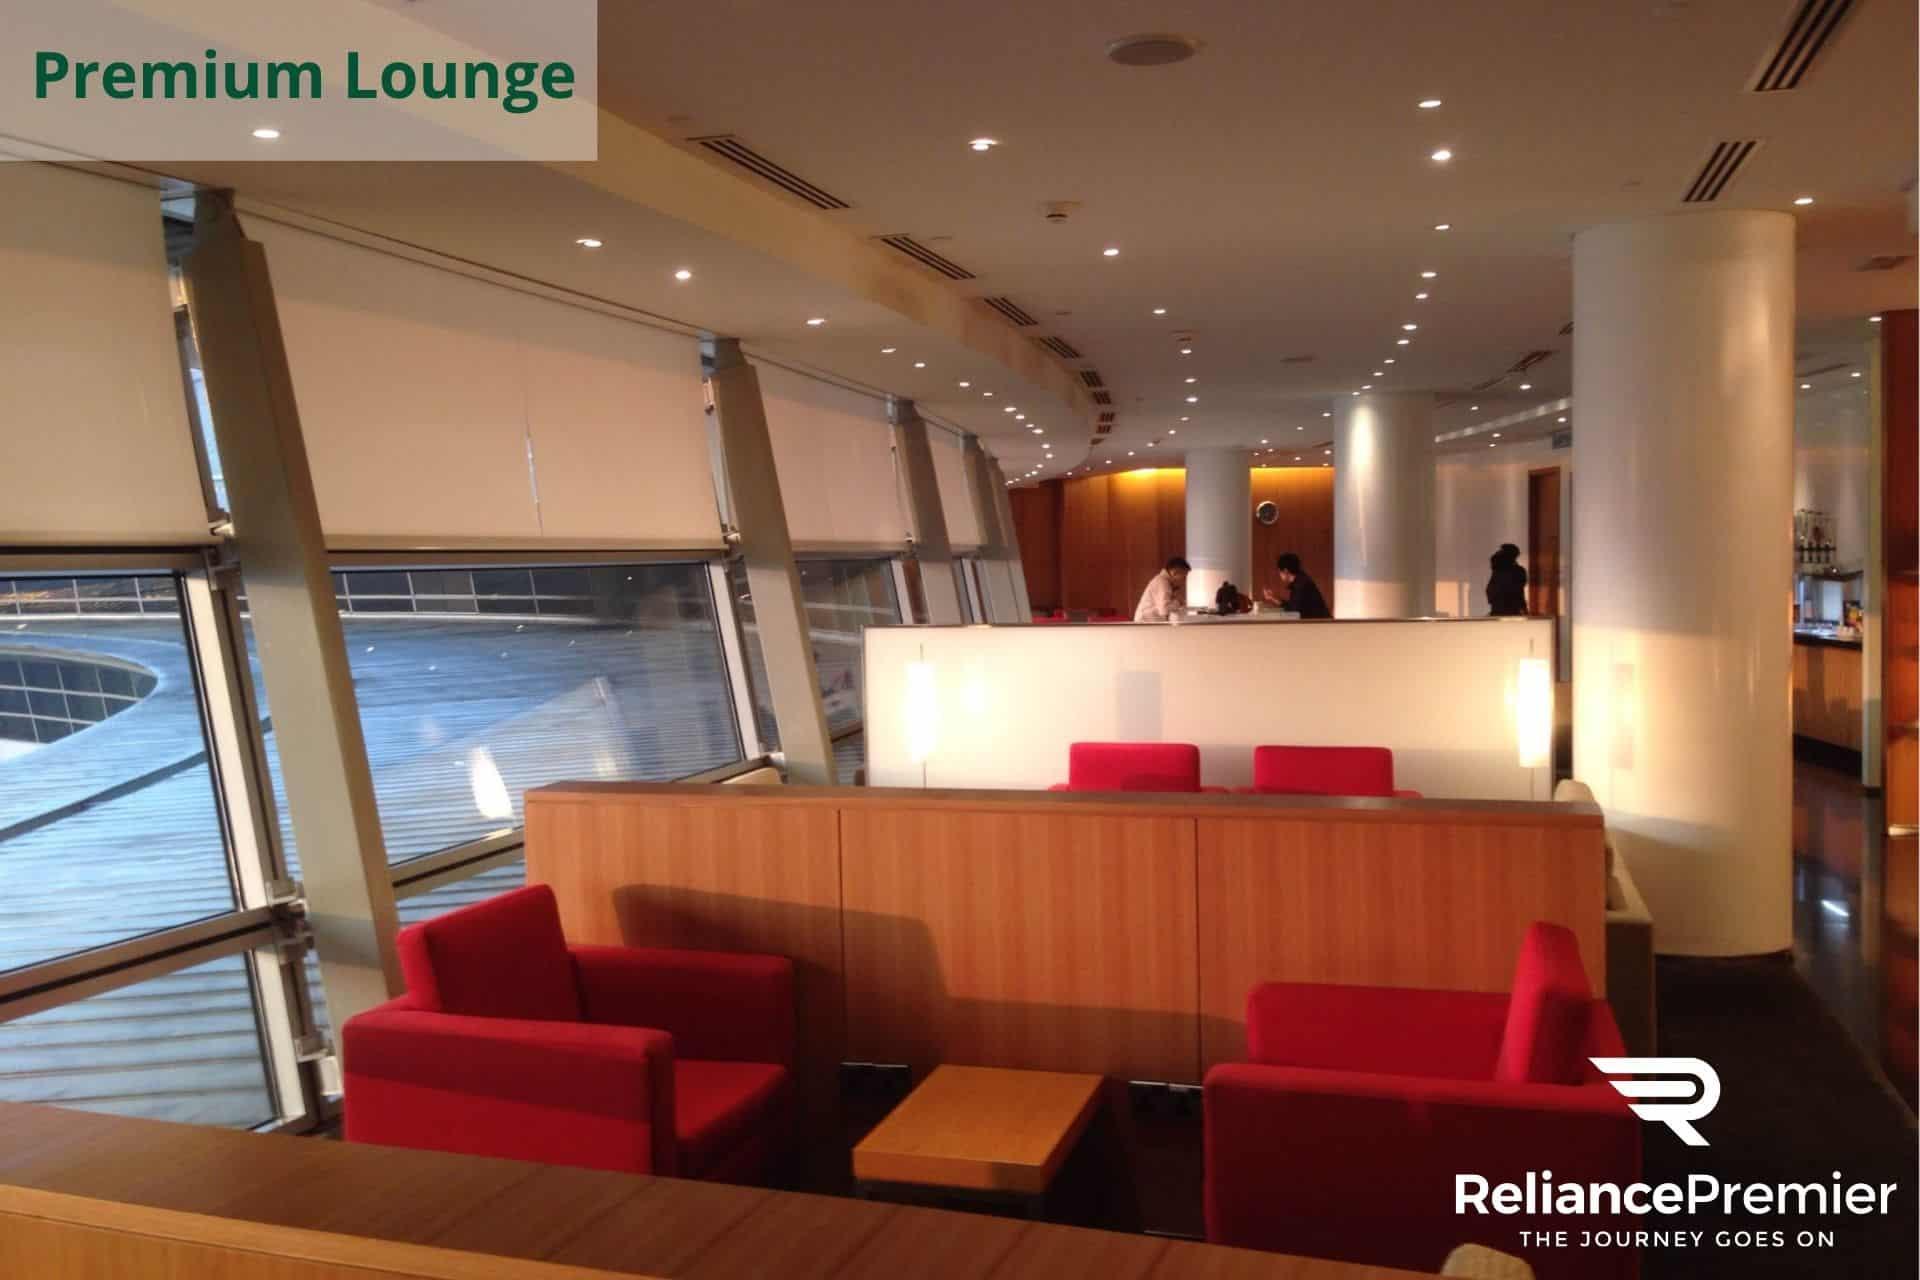 Cathay pacific Premium Lounge